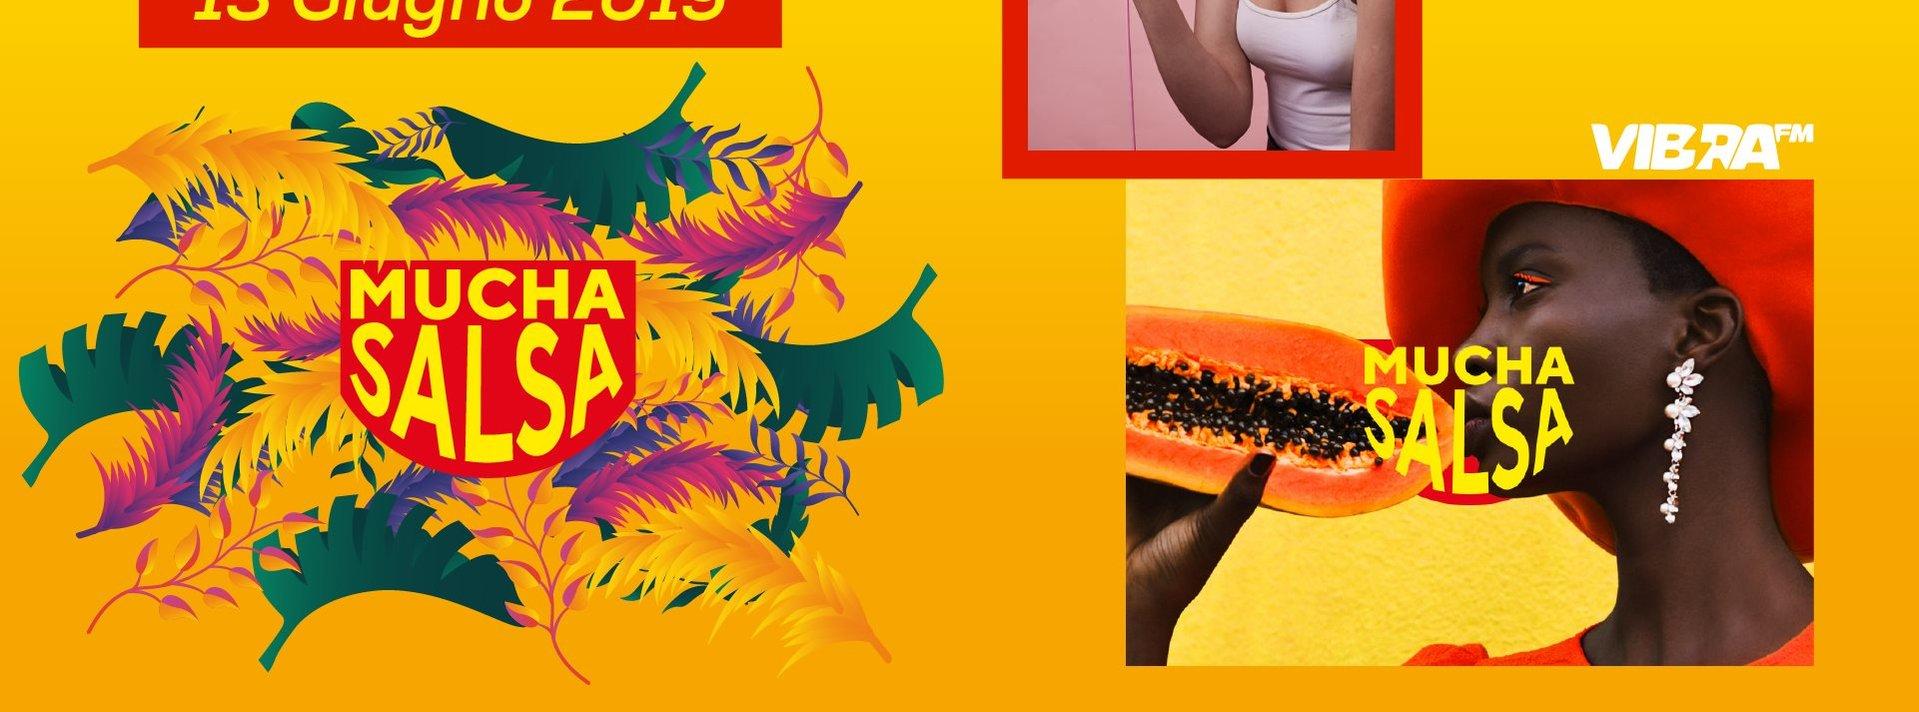 Mucha salsa - 13 giugno 2019